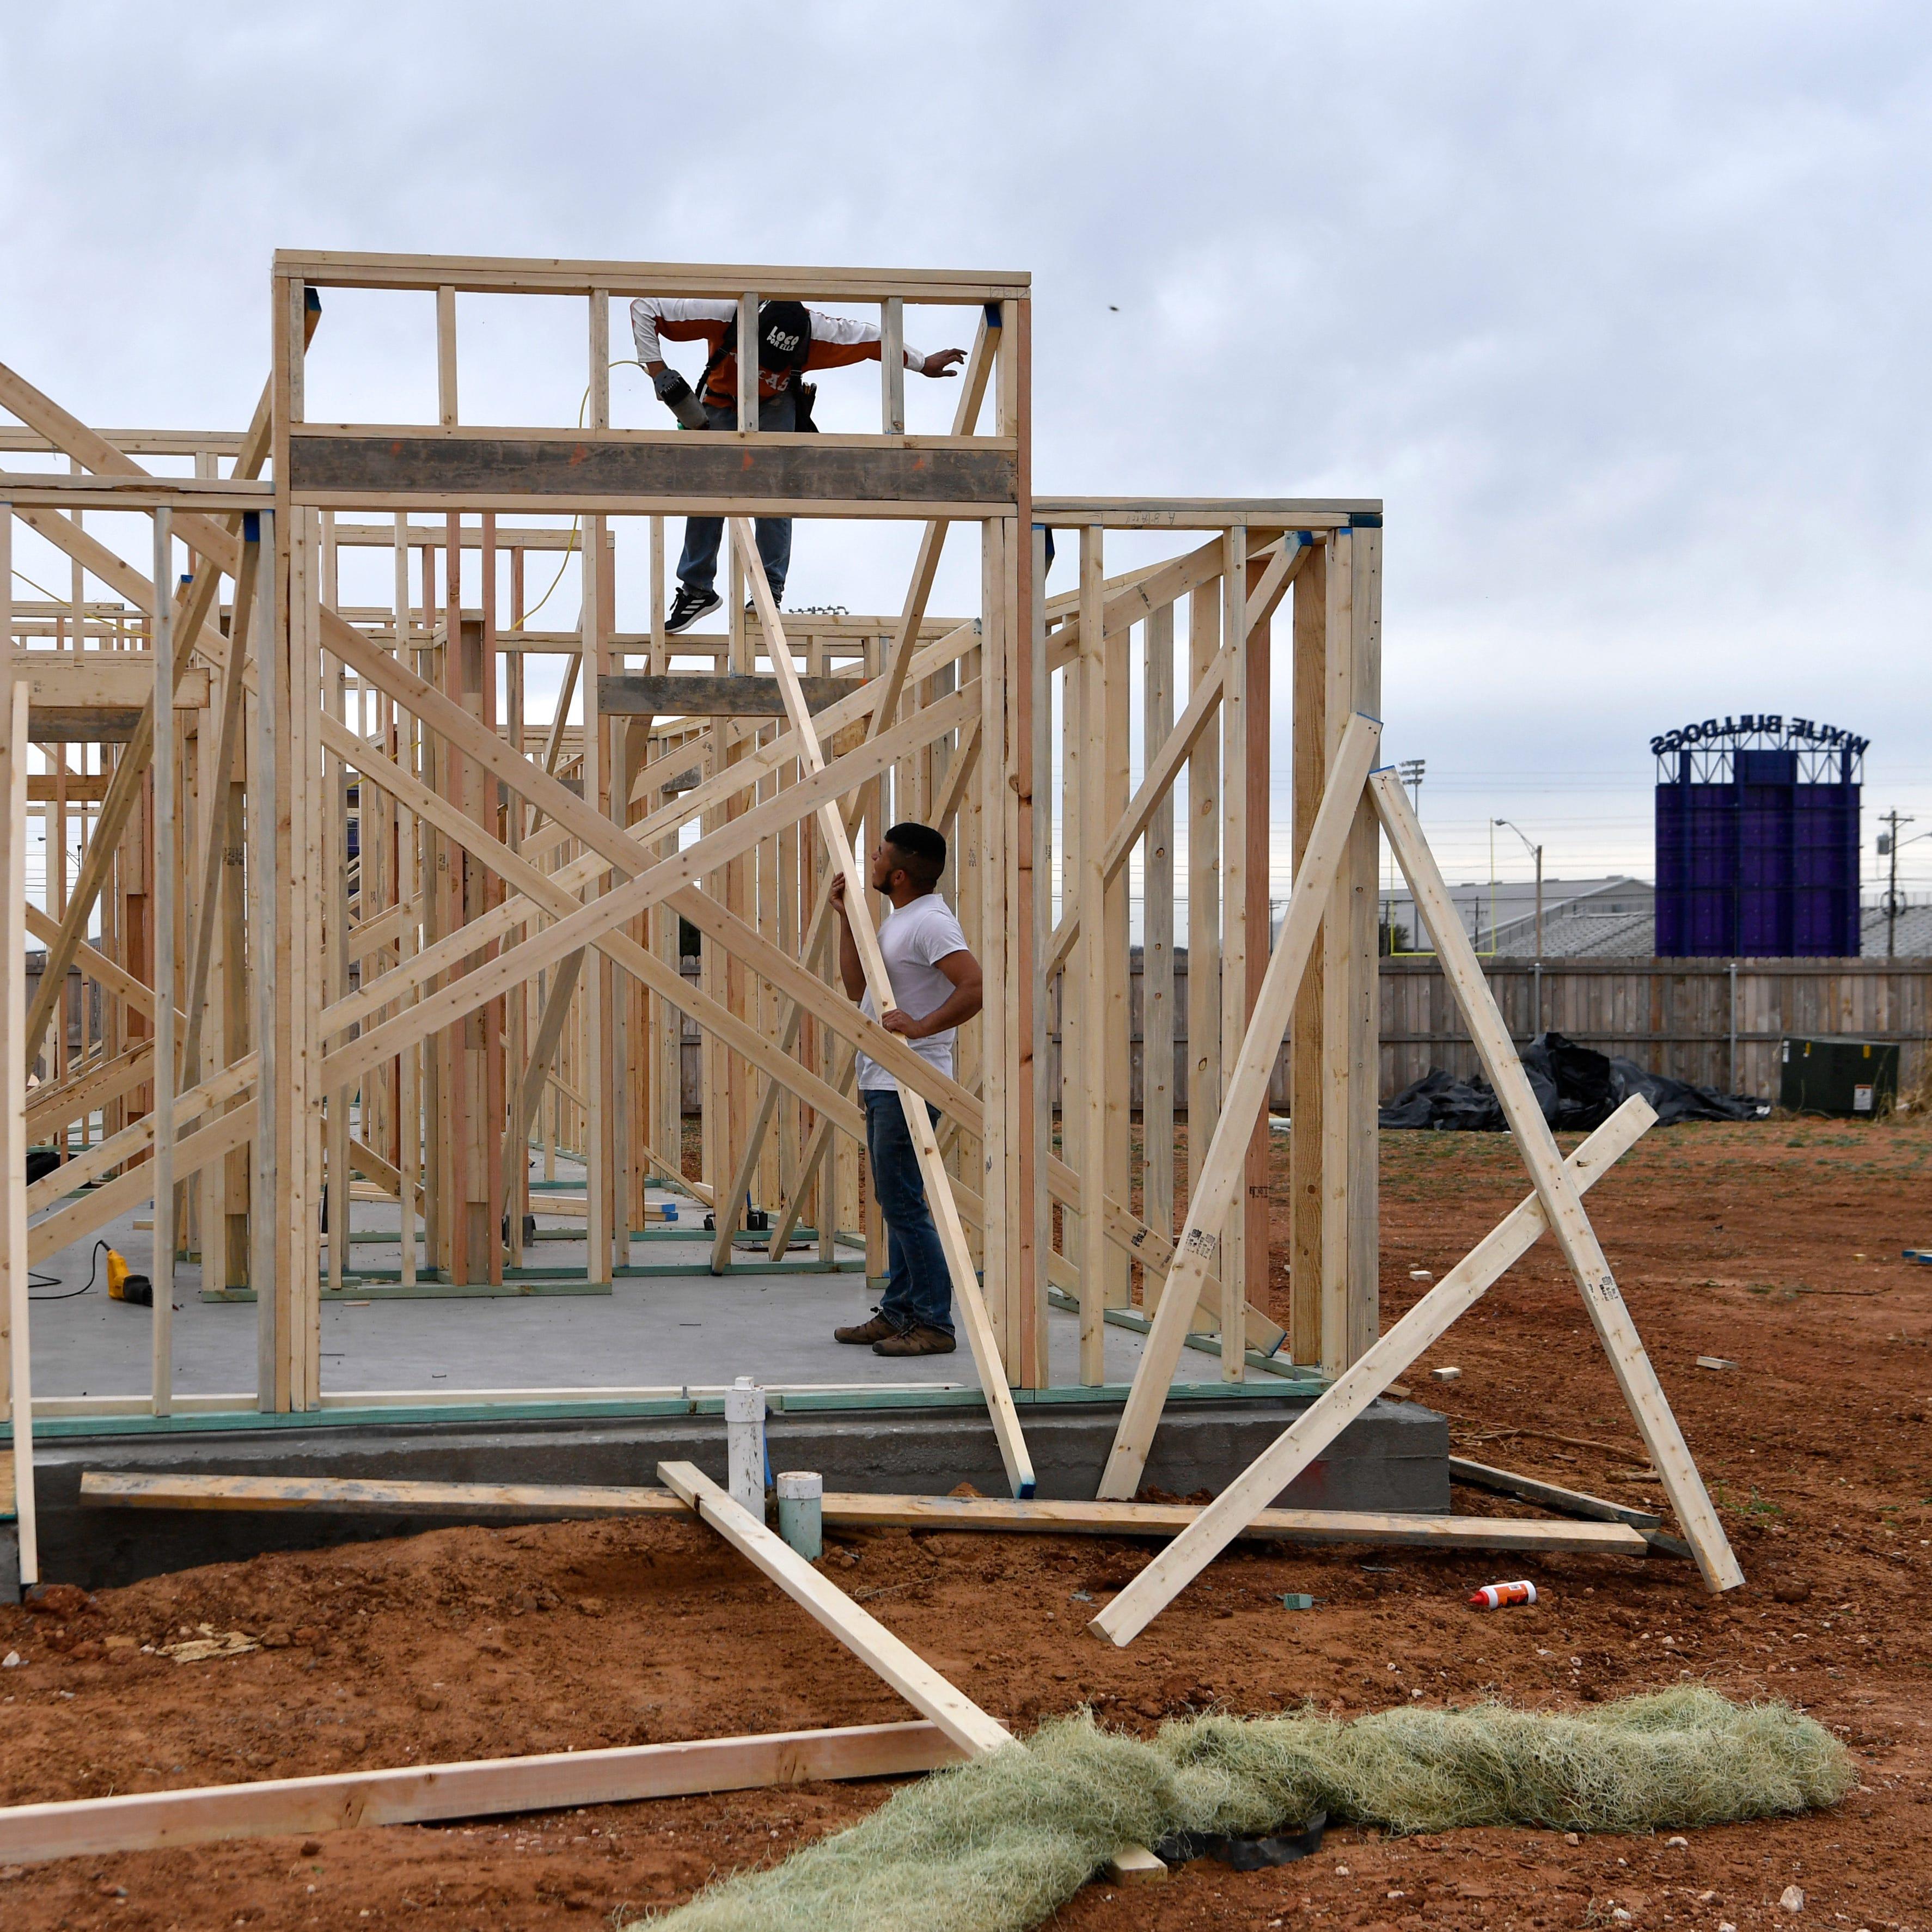 Progress: New neighborhoods in south Abilene attracting businesses